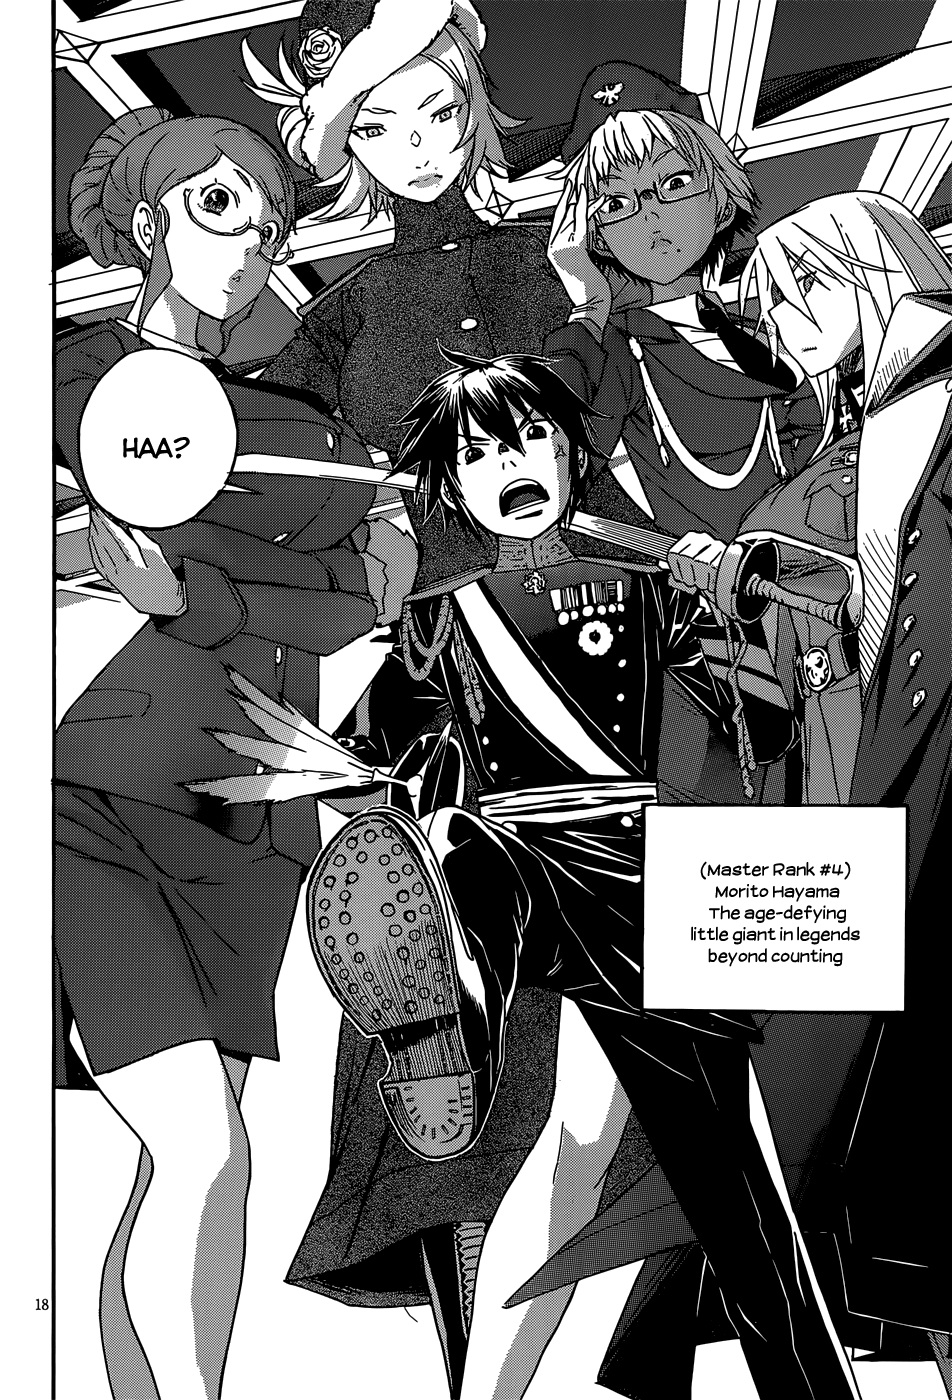 Any Good Martial Arts Anime Or Manga Anime For The People Disqus